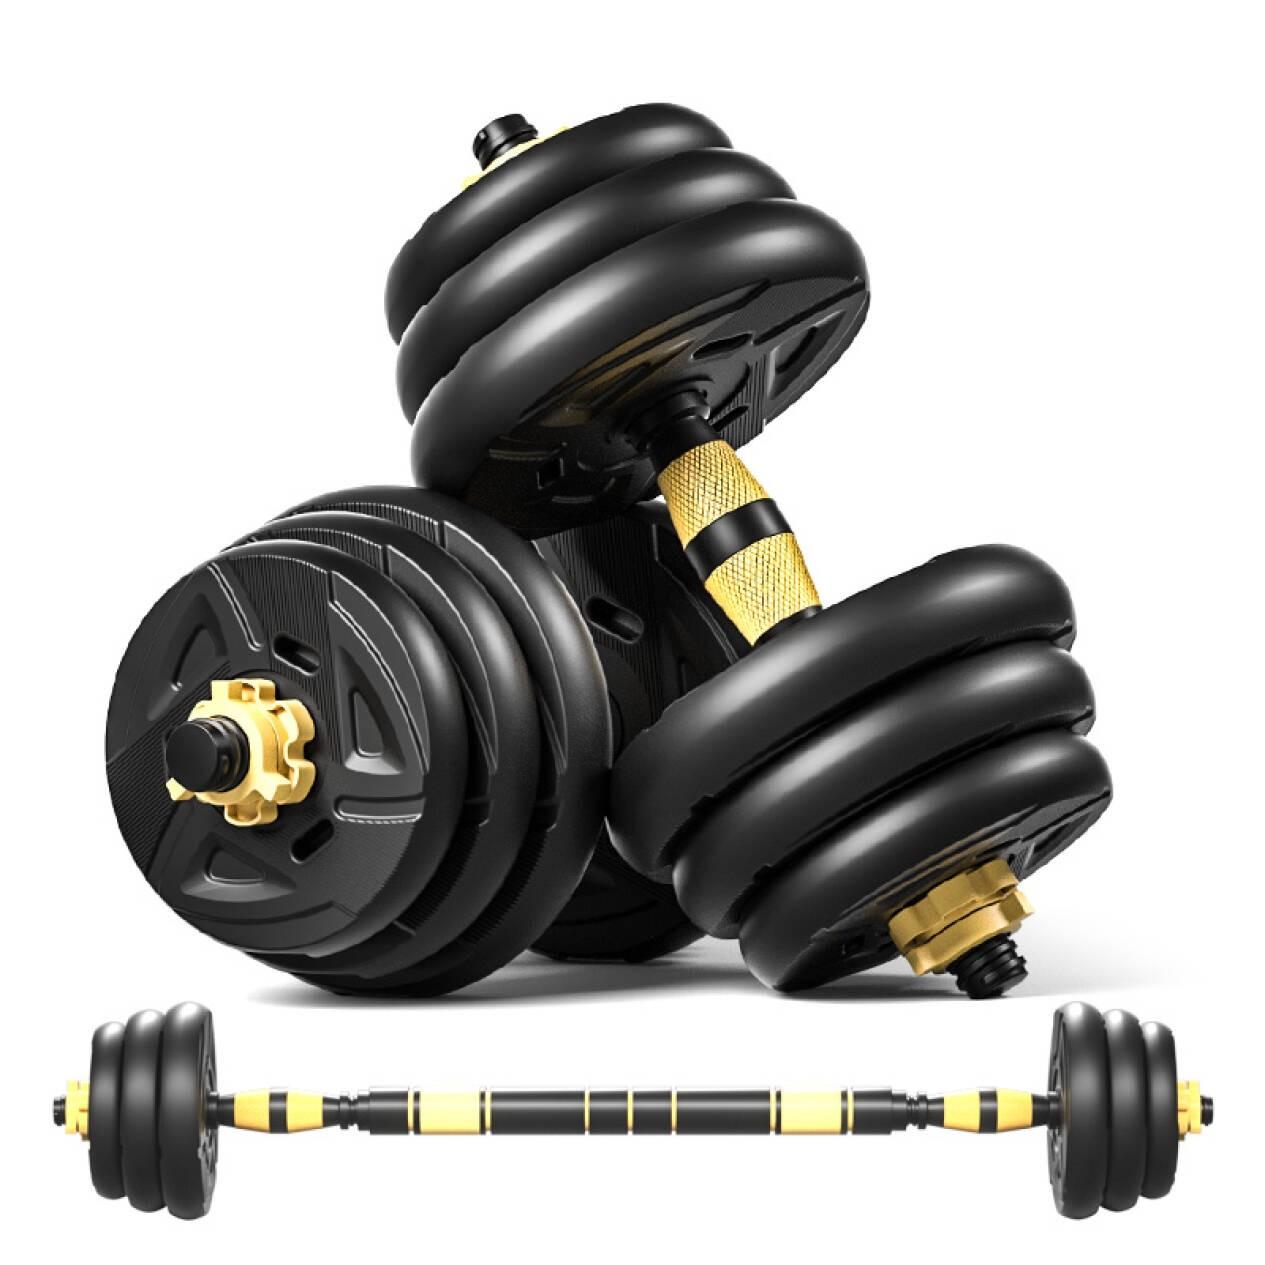 NHONOR 欧耐 黄杆可拆卸杠铃组合套装 20kg (40cm连接杆)